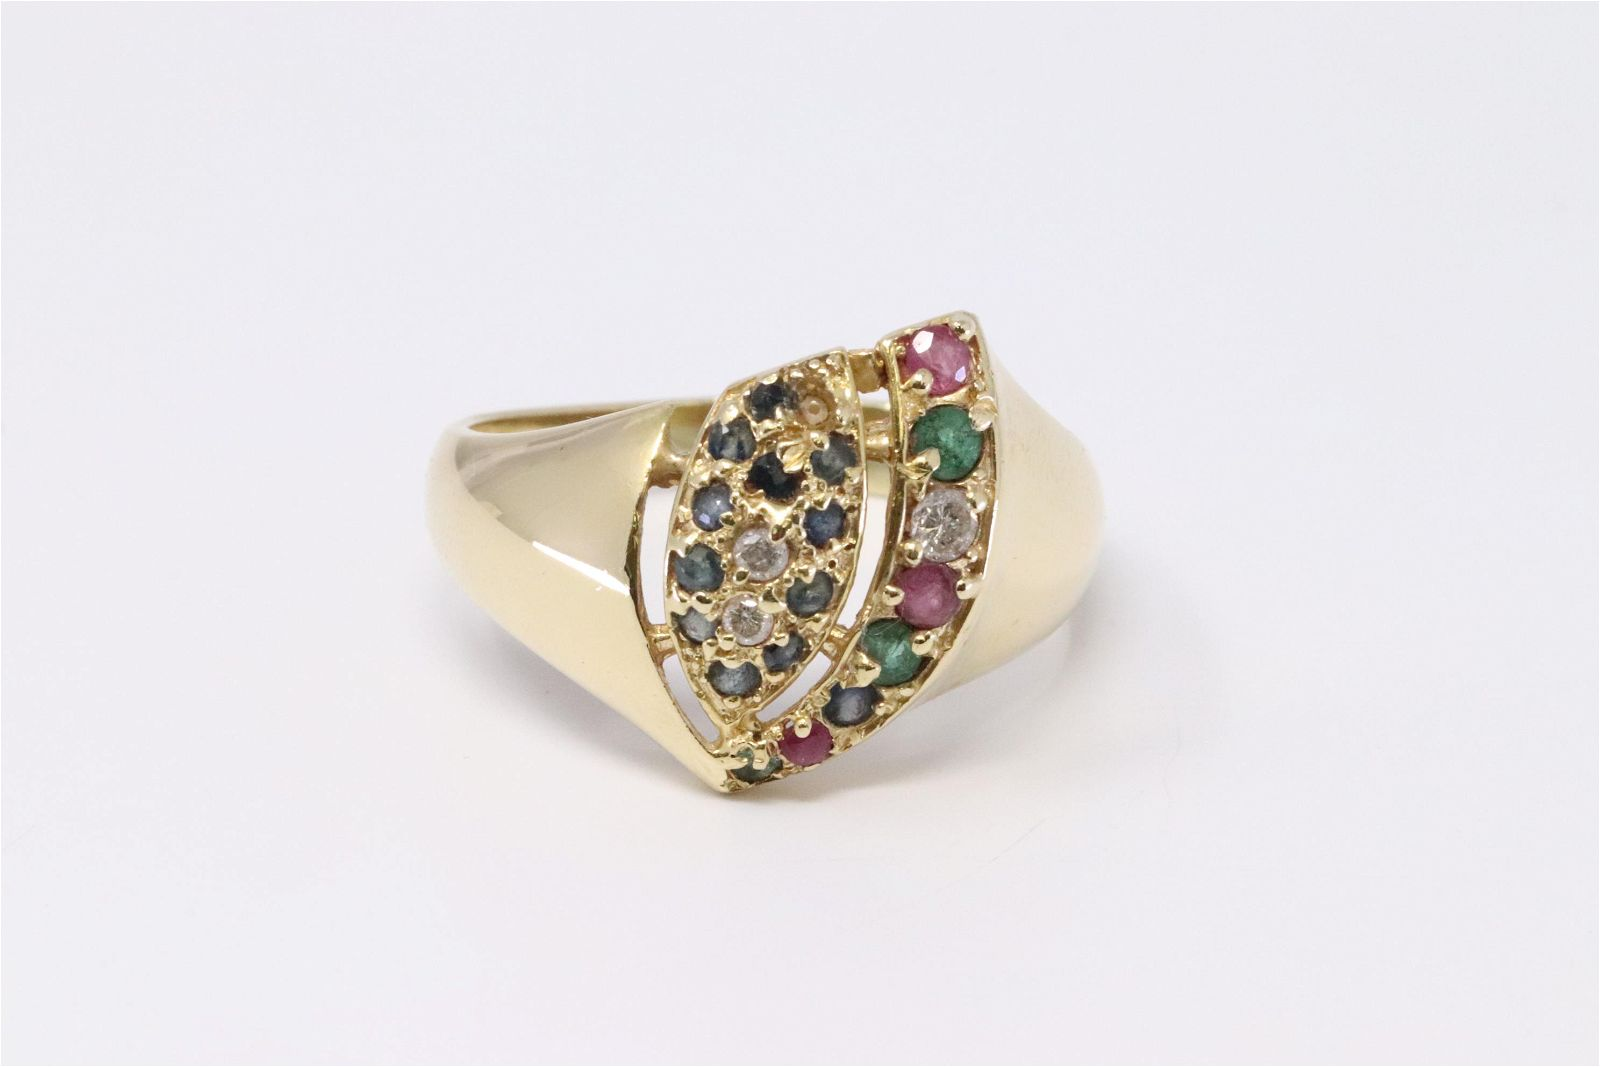 18KT Vintage Diamond/Sapphire/Ruby/Emerald Ring